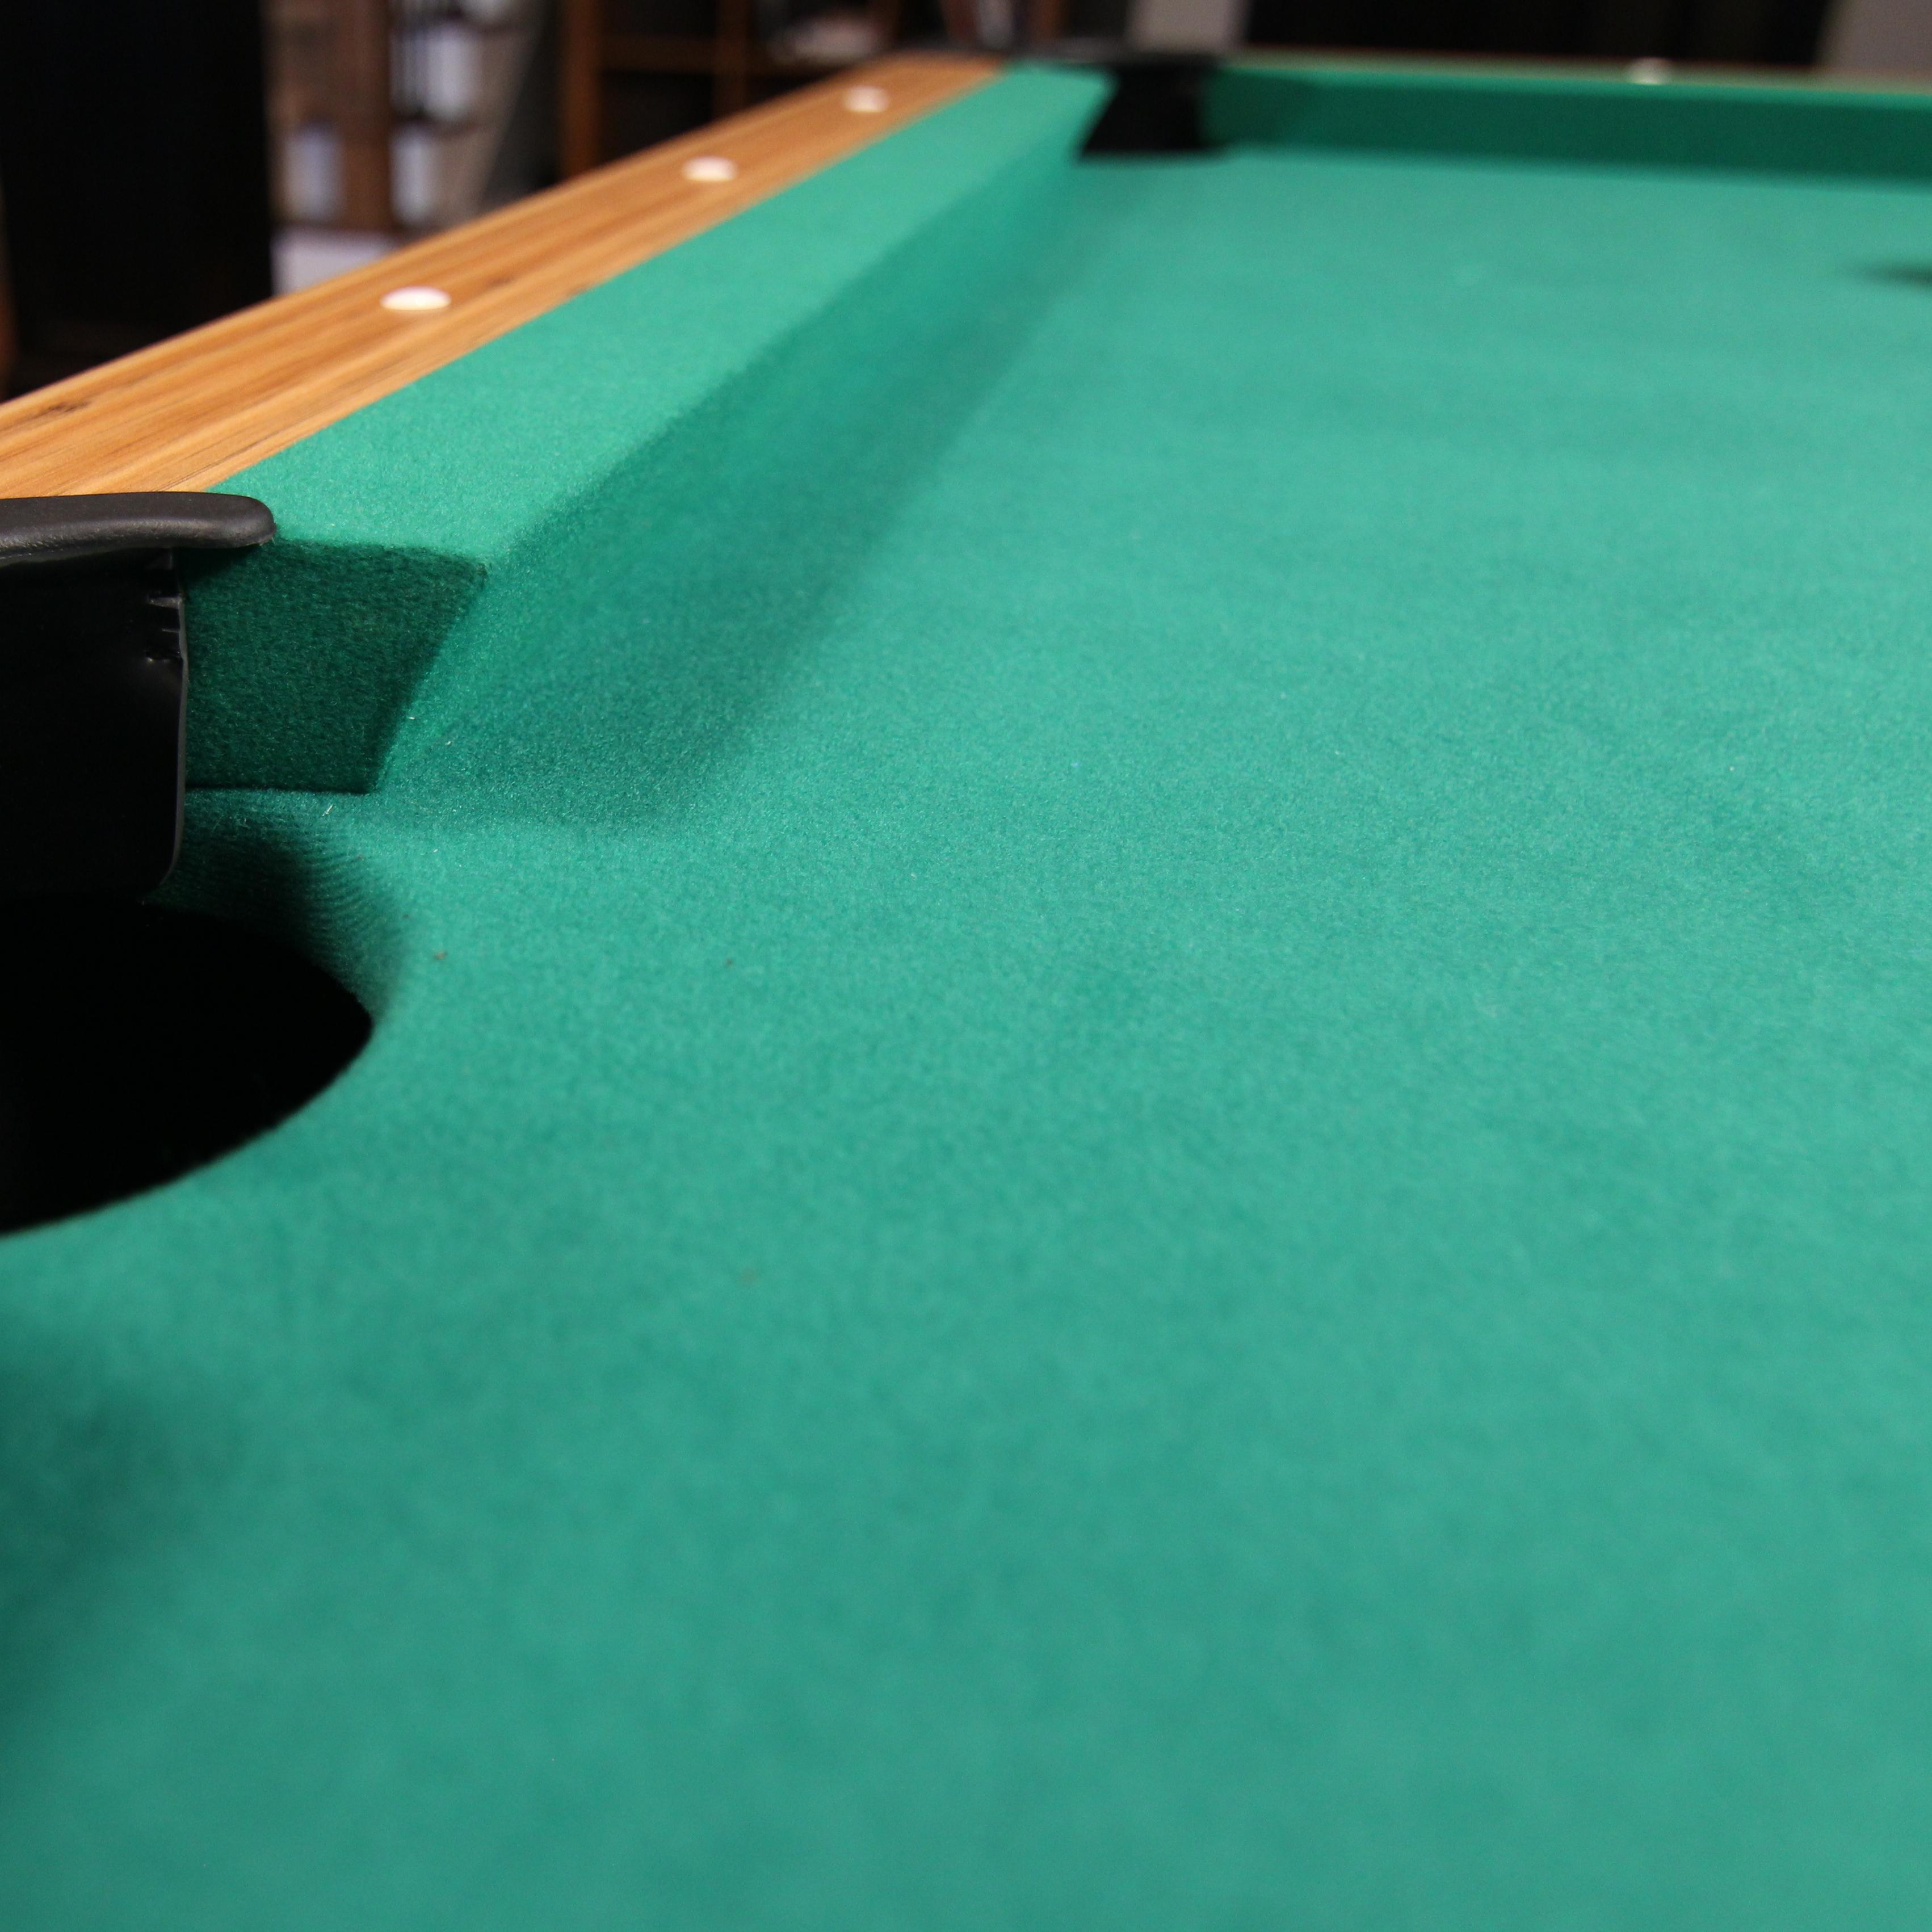 Mizerak dynasty space saver 6 5 39 billiard - Space needed for pool table ...